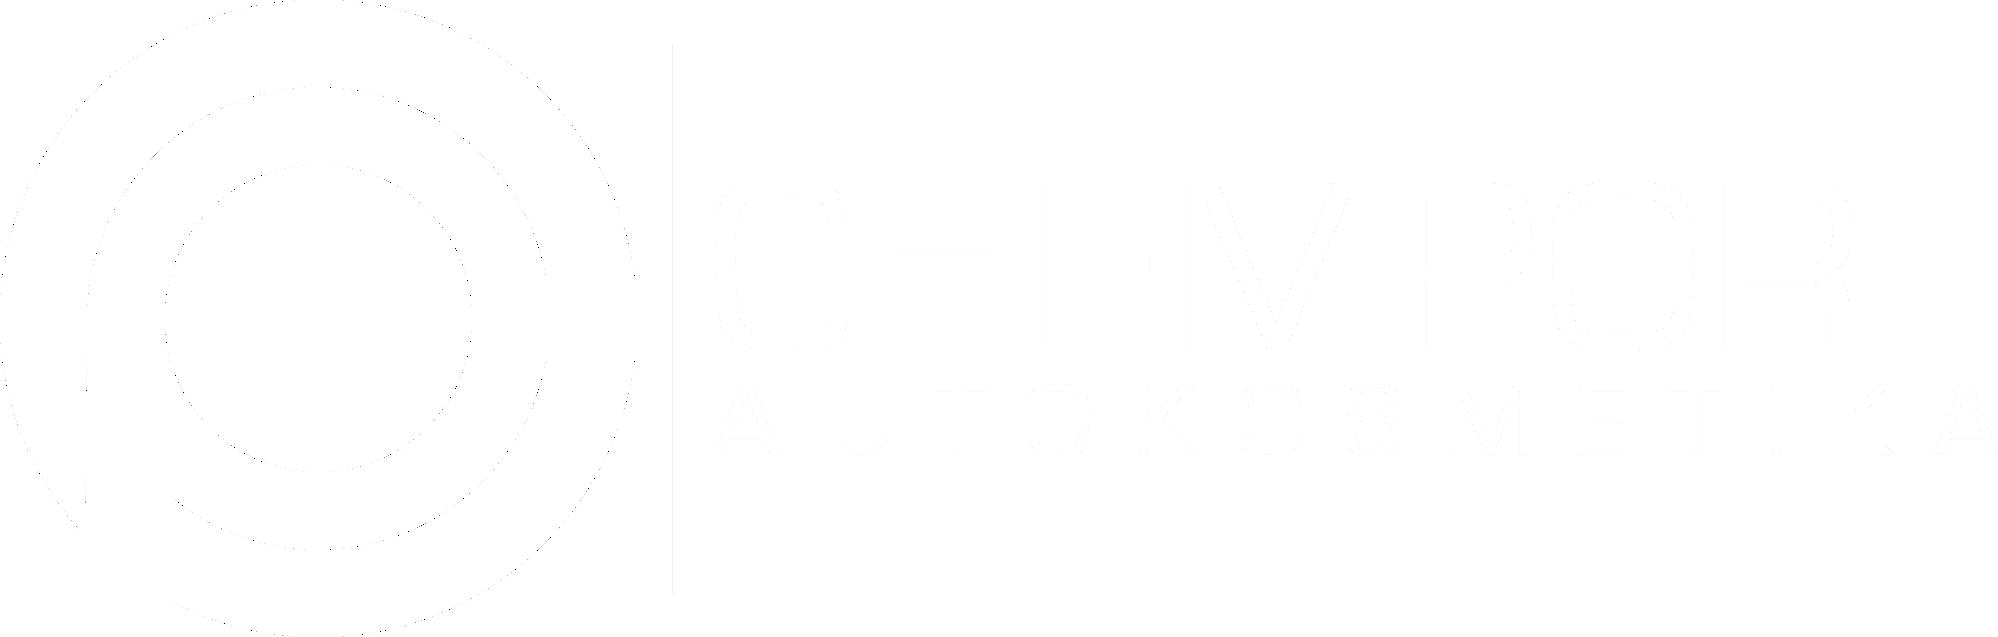 chemport.cz